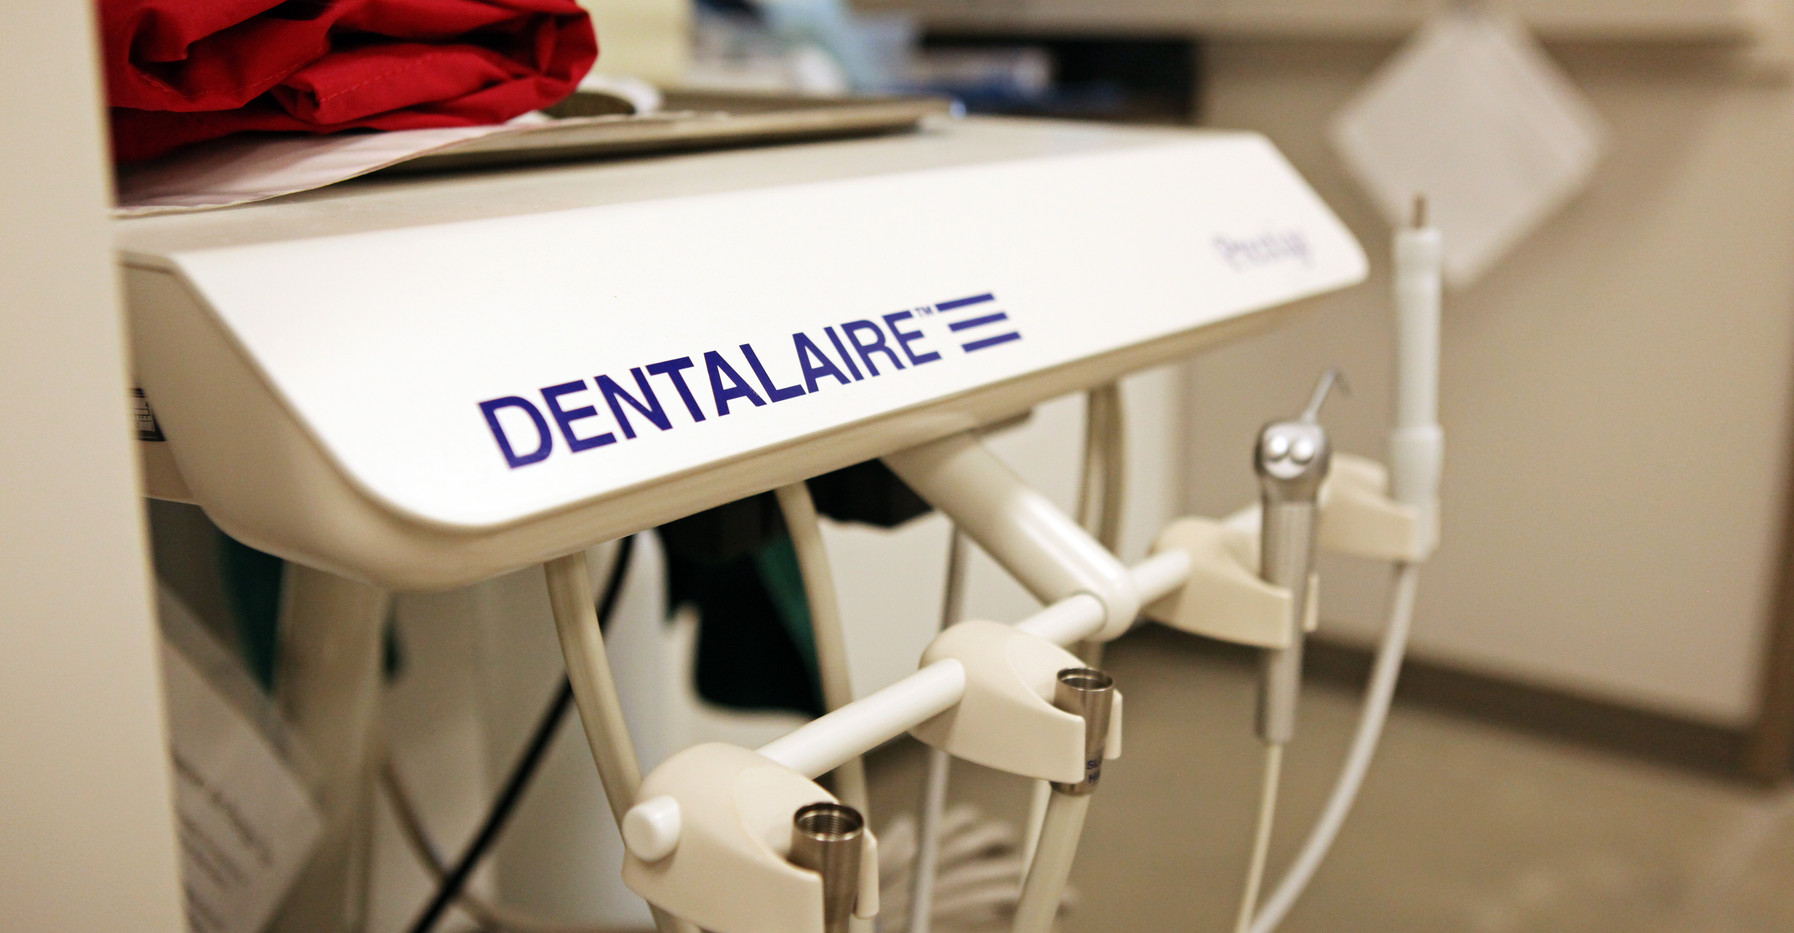 Dental Machine